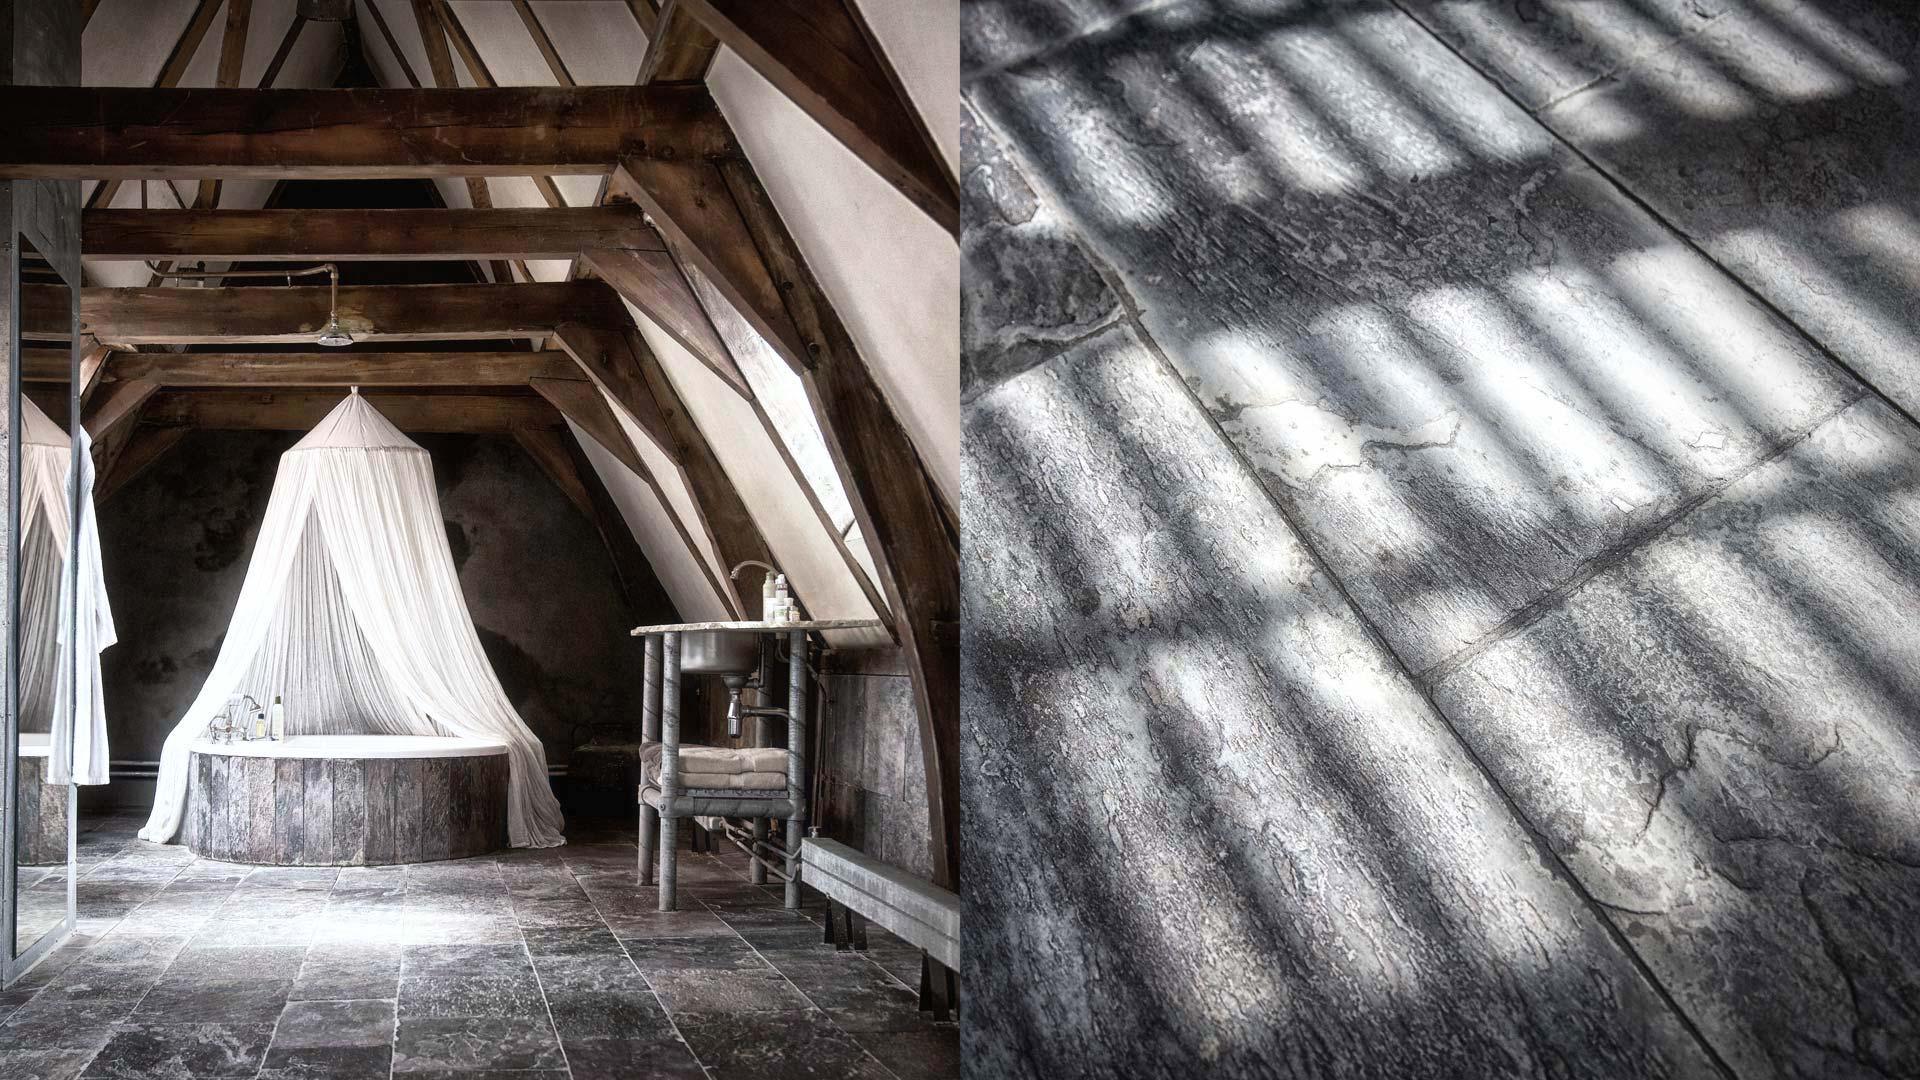 PDJPhoto, Peter de Jong, sluisweg 59, 2225 xj, Katwijk,  2010, Home, bathroom, Amsterdam, sunlight, bath, interieur